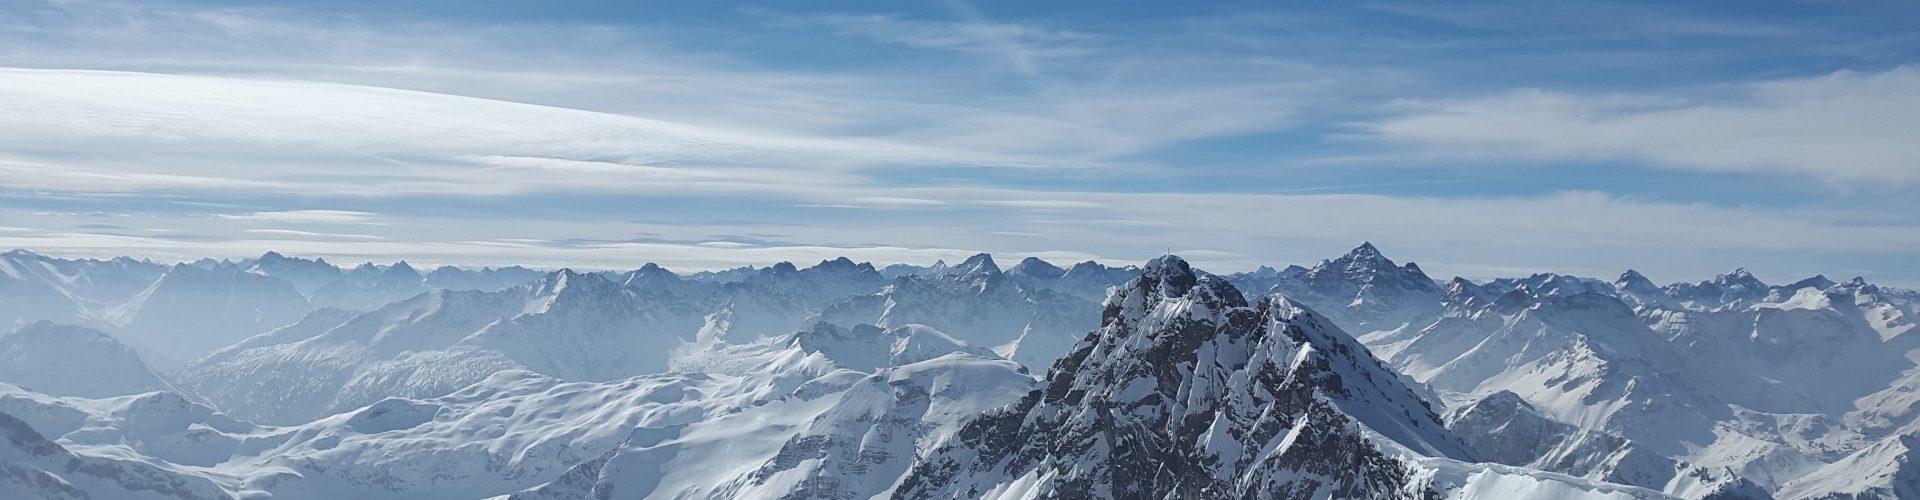 adventure-alpine-altitude-355241